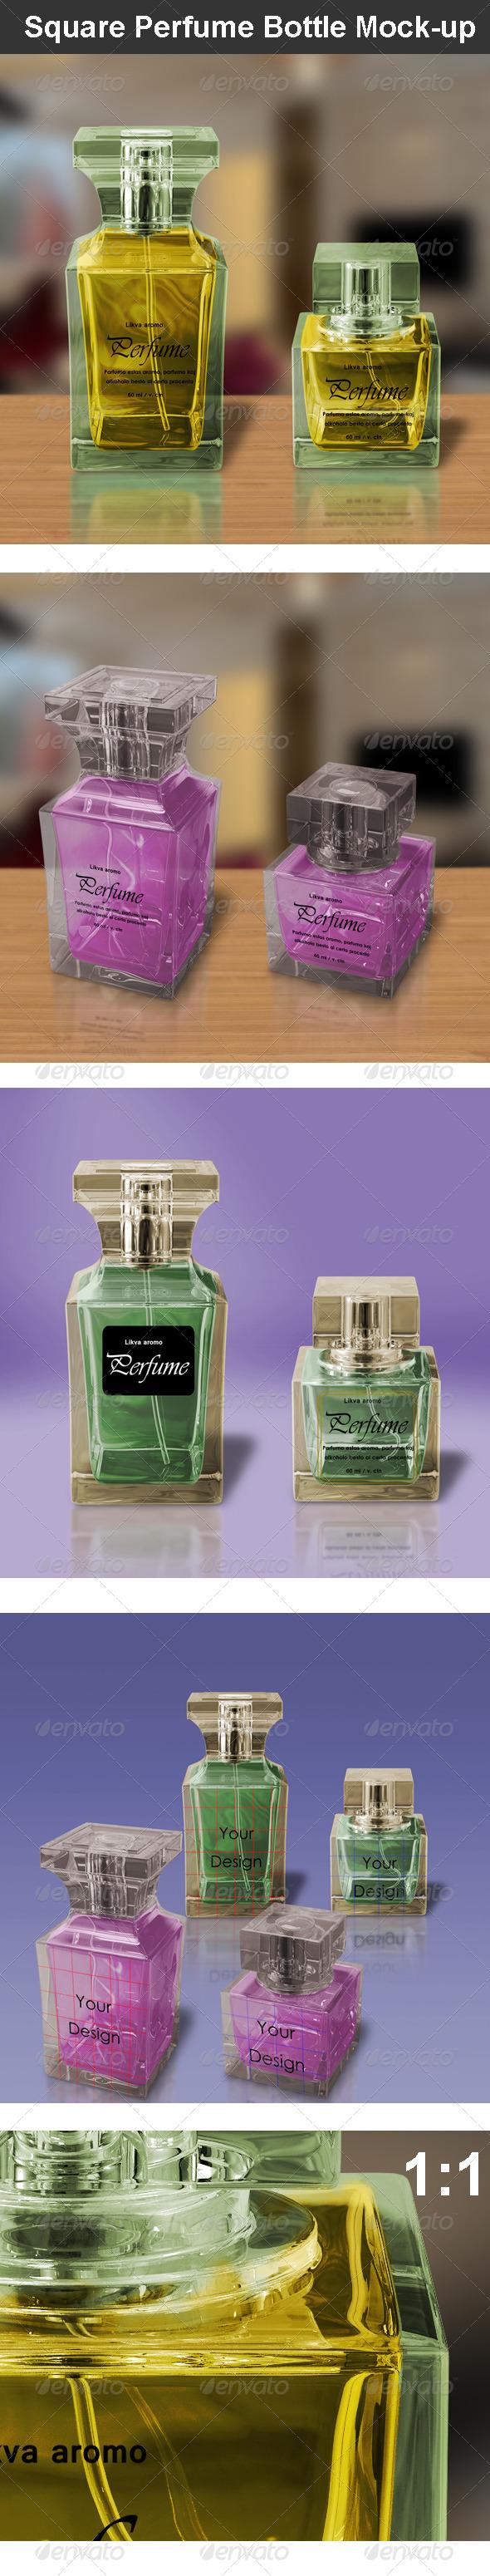 Square Perfume Bottle Mock-up